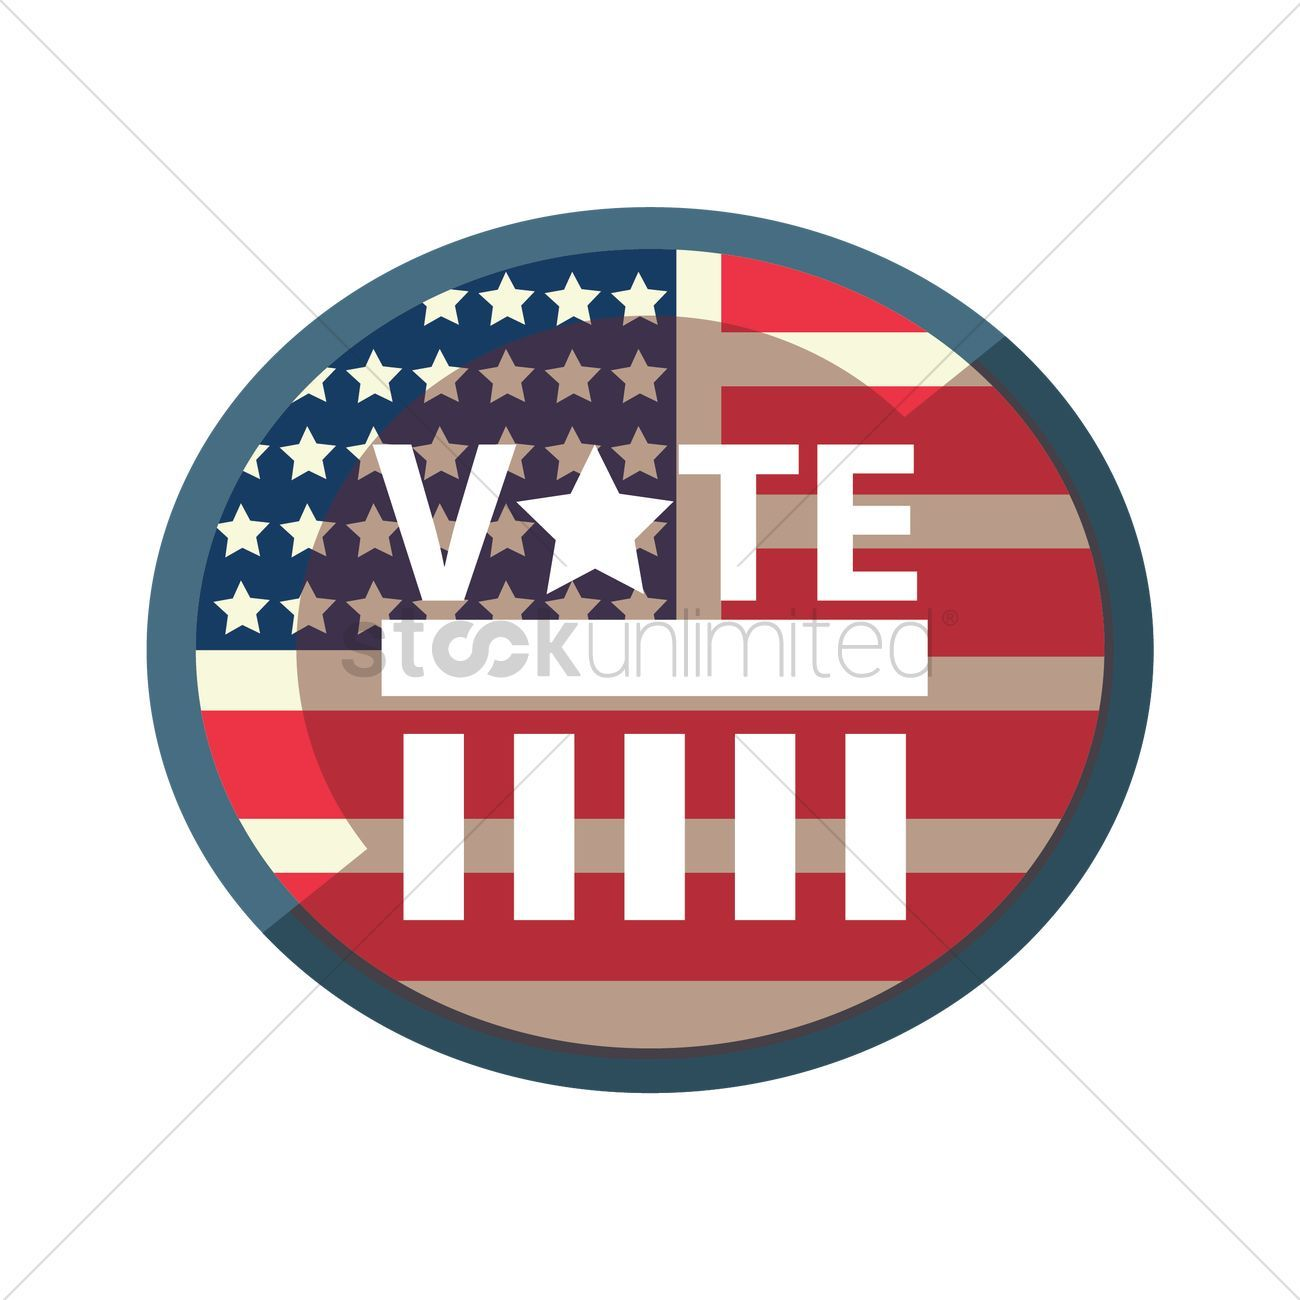 Vote On Usa Flag Vectors Stock Clipart Sponsored Flag Usa Vote Clipart Stock Affiliate In 2020 Chicago Cubs Logo Flag Vector Sport Team Logos